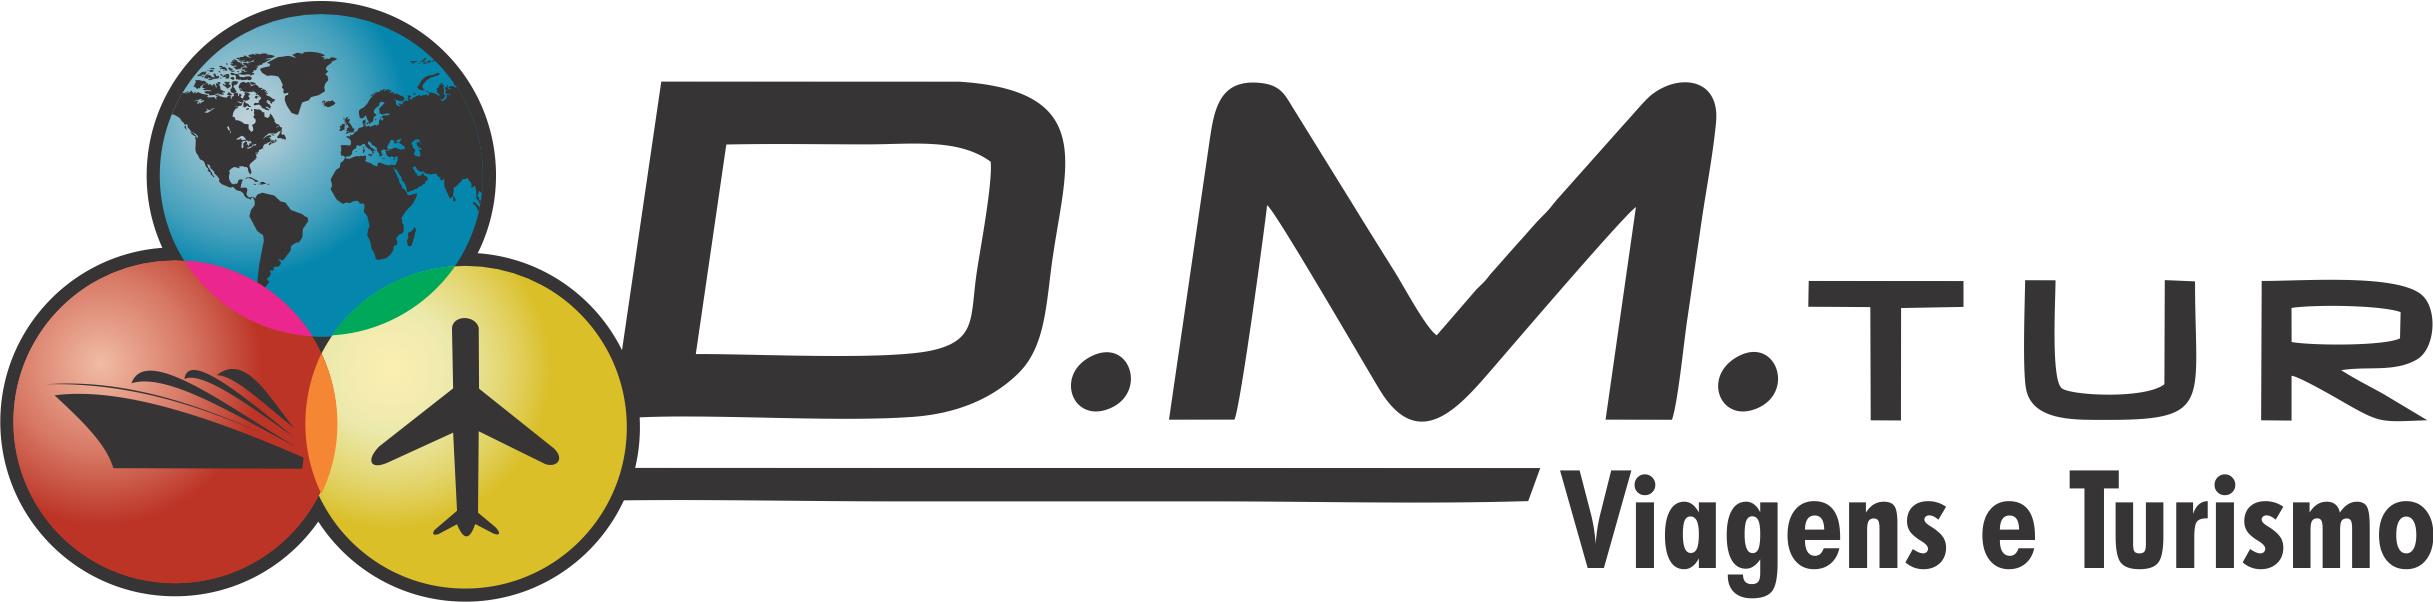 D.M. Tur [Letra Preta]